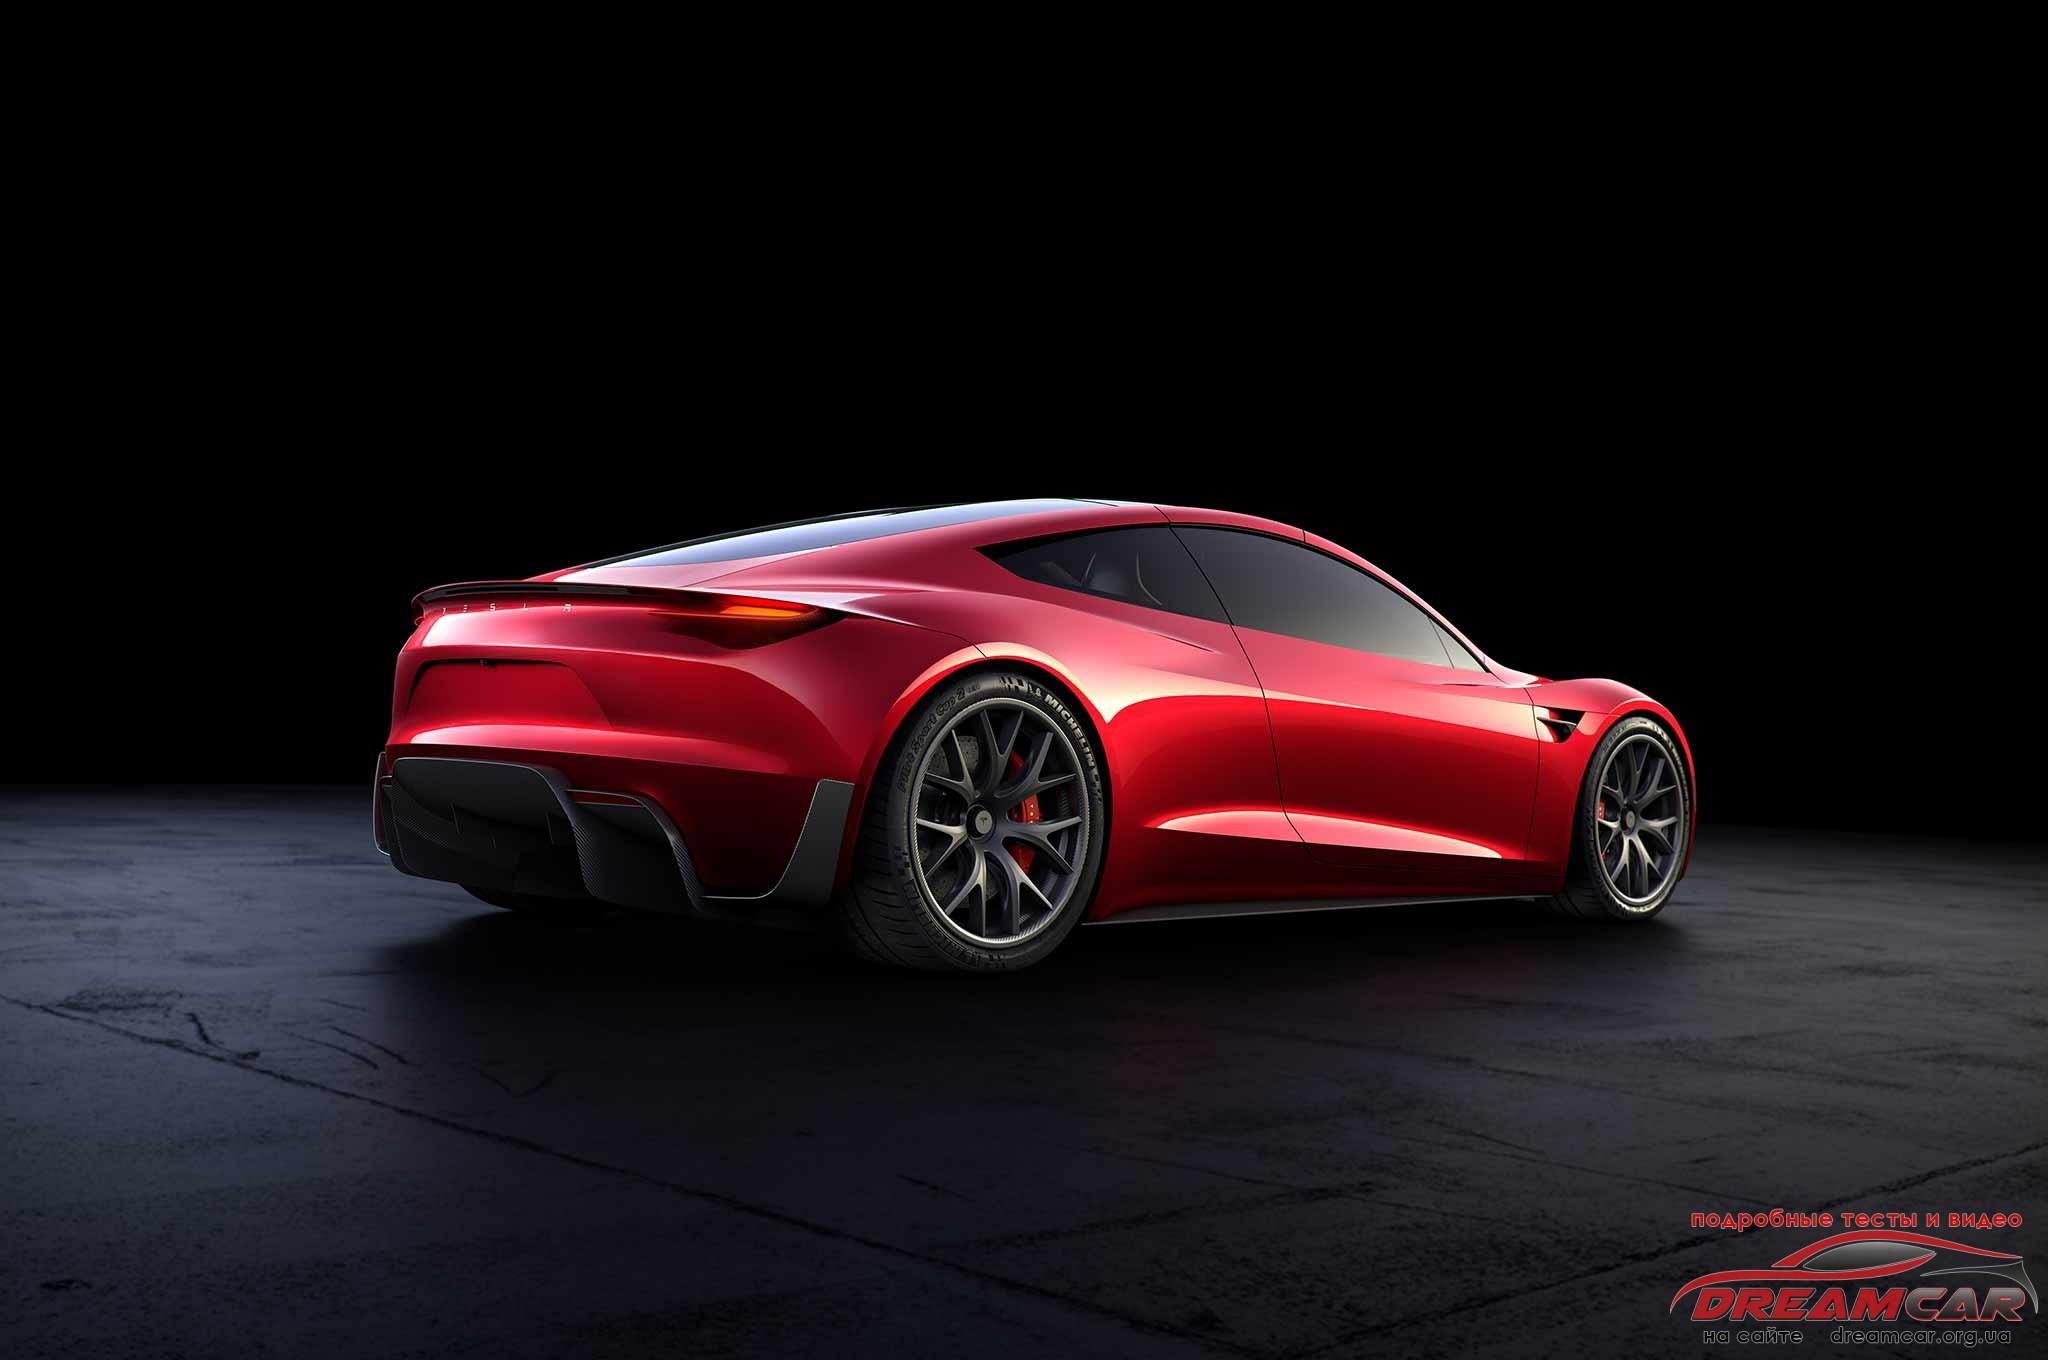 2020-Tesla-Roadster-06-1